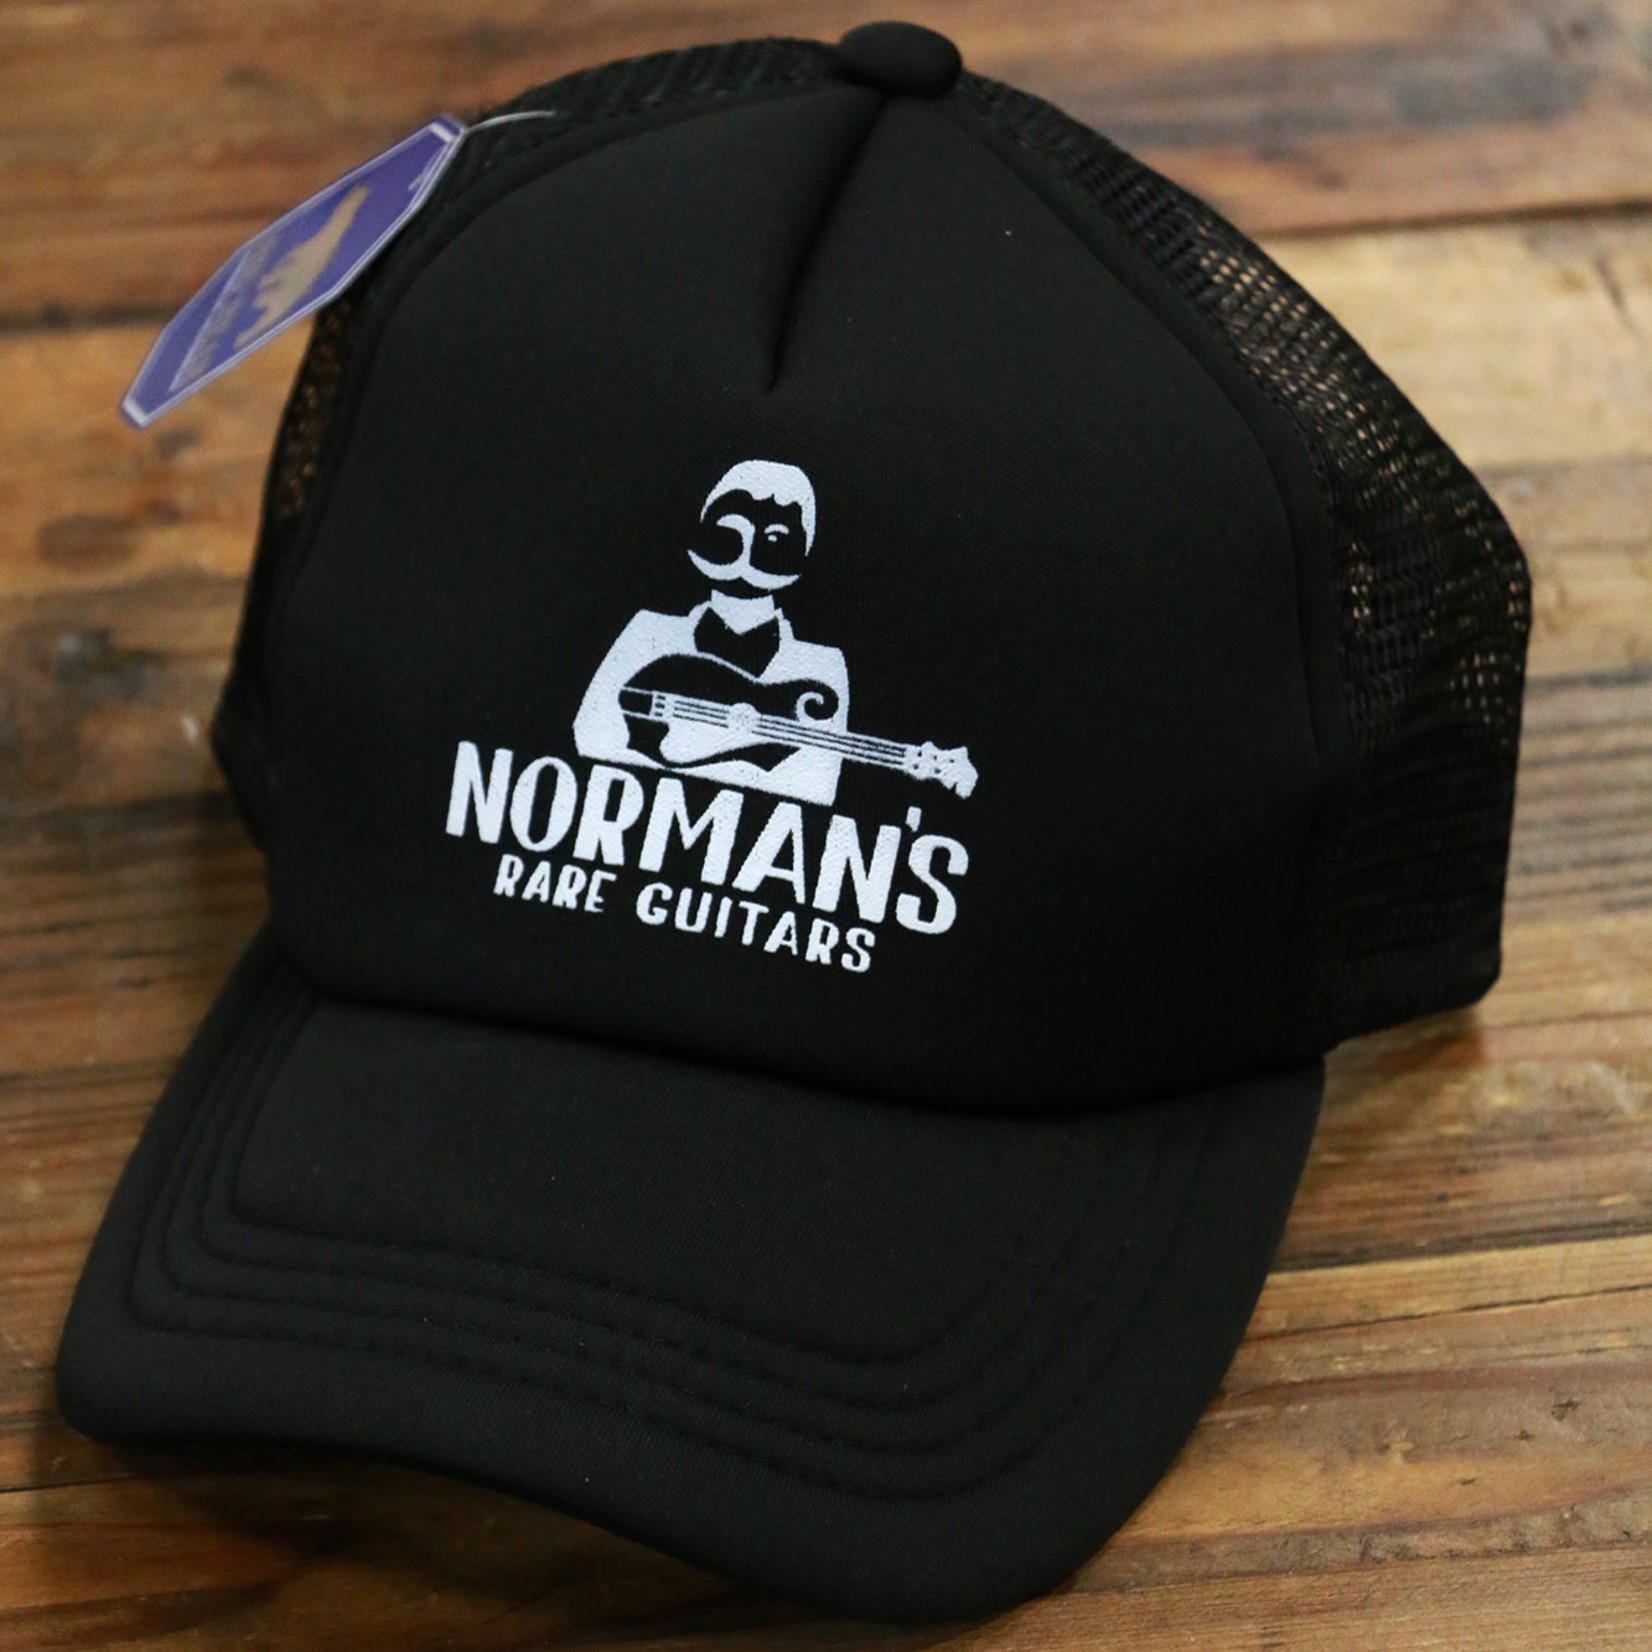 Norman's Rare Guitars NRG Black Trucker Hat